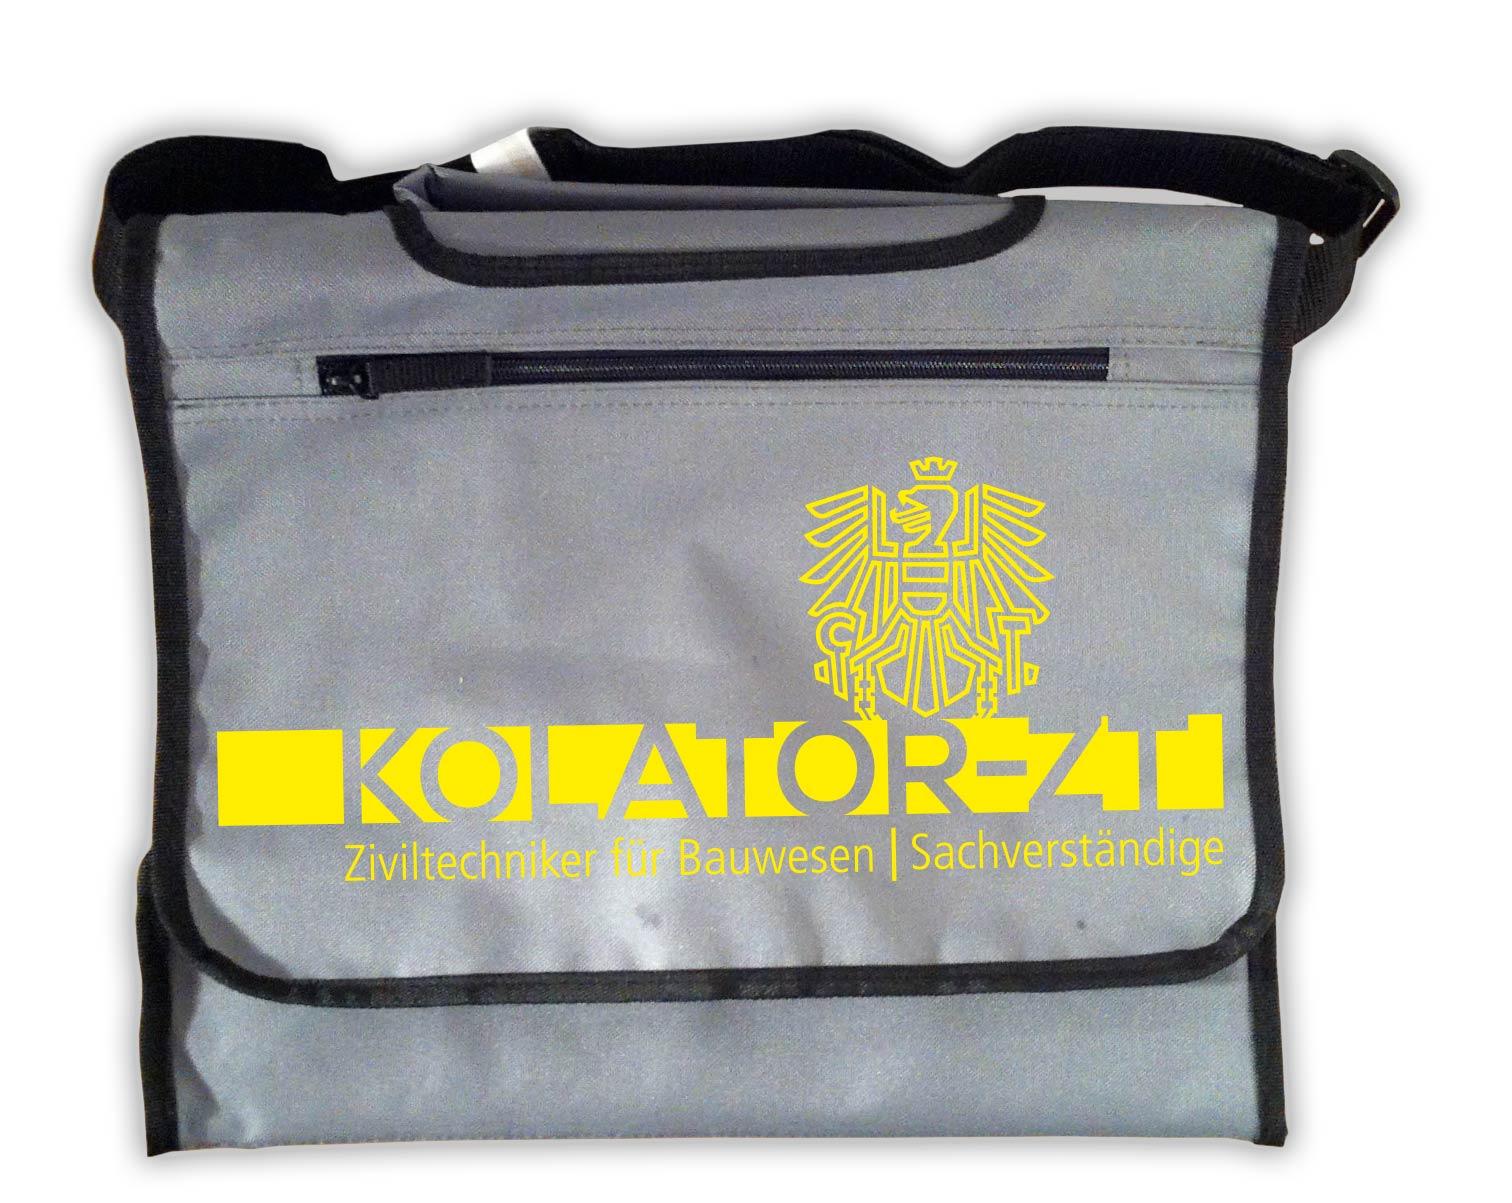 Kolator ZT GmbH Messenger Bag